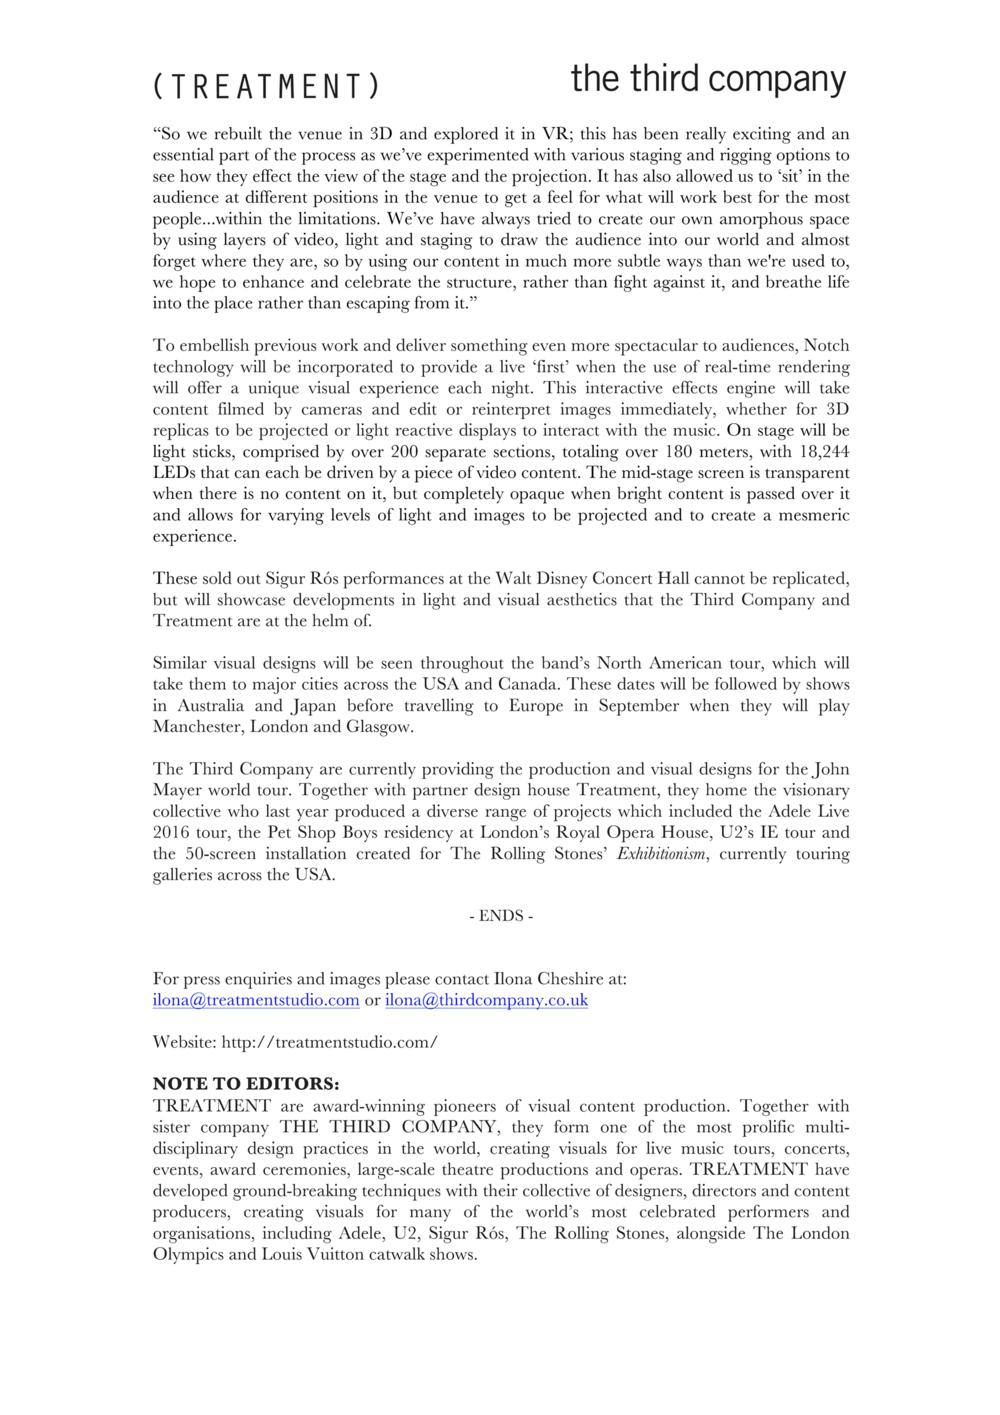 Sigur-Ros-announcement_Page_2.png